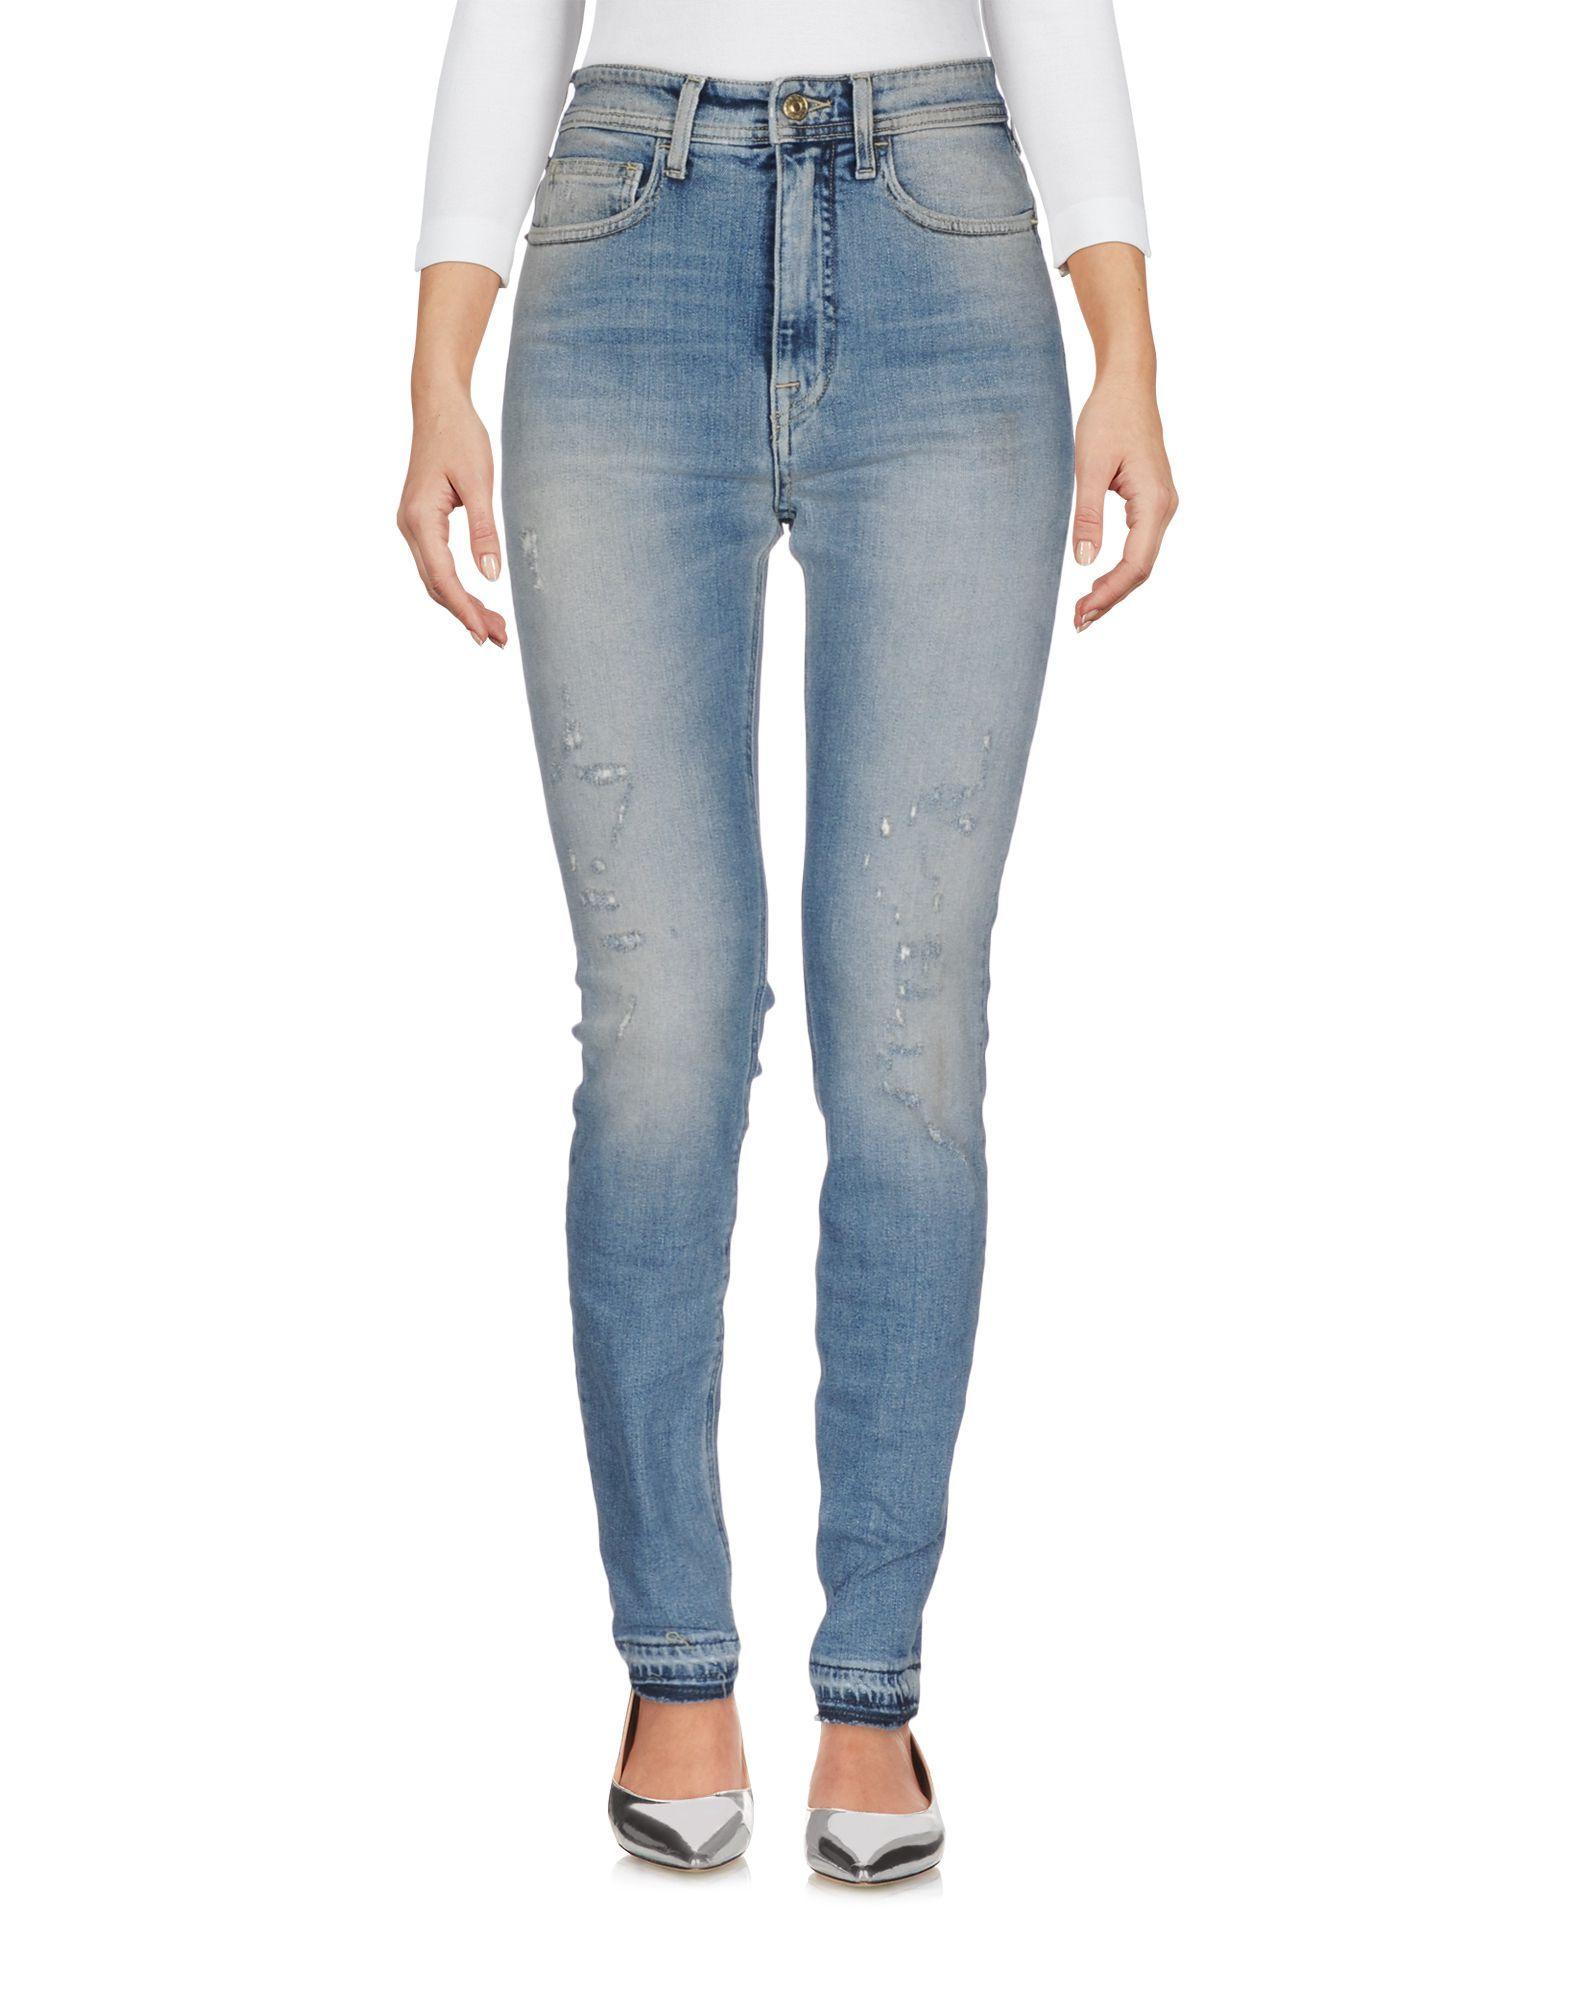 Cycle Women's Denim Trousers Blue Cotton